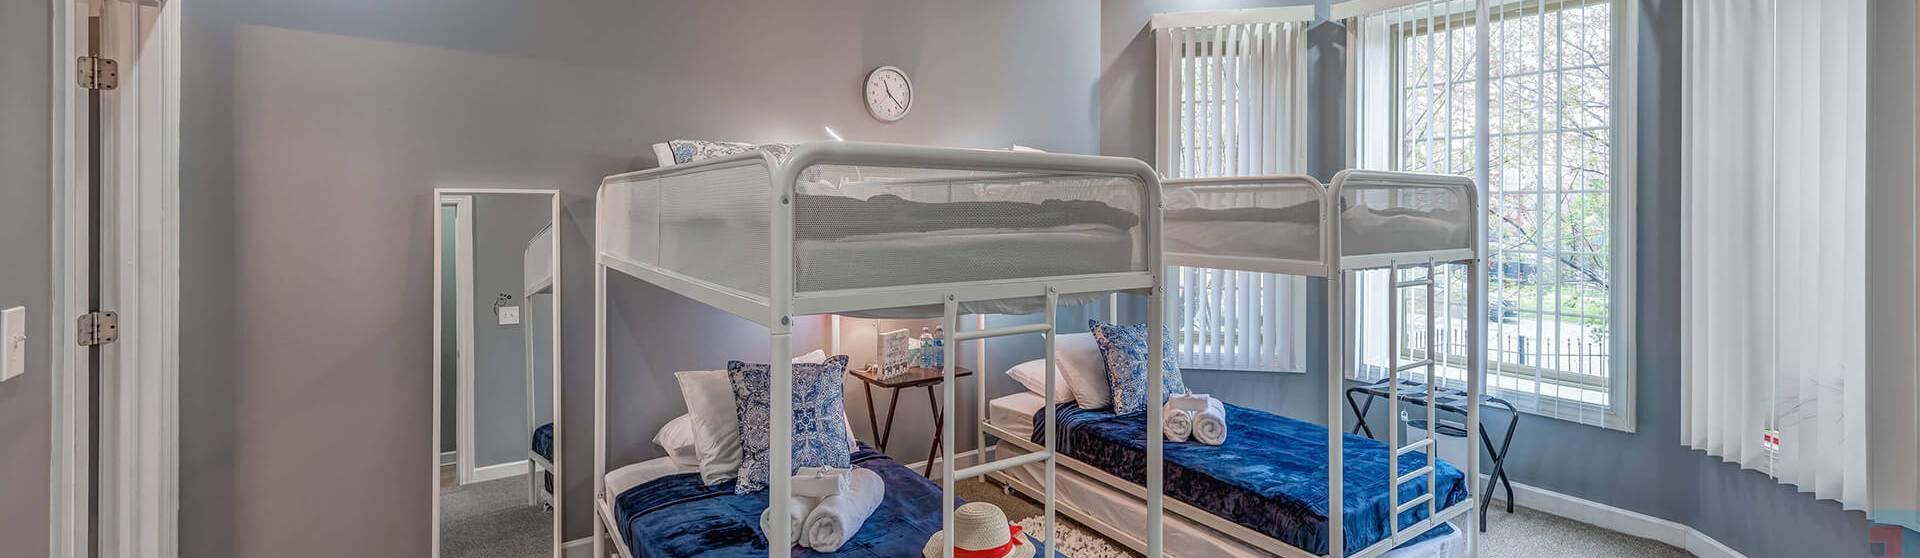 6433 South Kenwood Avenue GN, Chicago, Illinois 60, Illinois, 1 Bedroom Bedrooms, ,1 BathroomBathrooms,One Bunk Bed,For Long Rent,6433 South Kenwood Avenue GN, Chicago, Illinois 60,1235